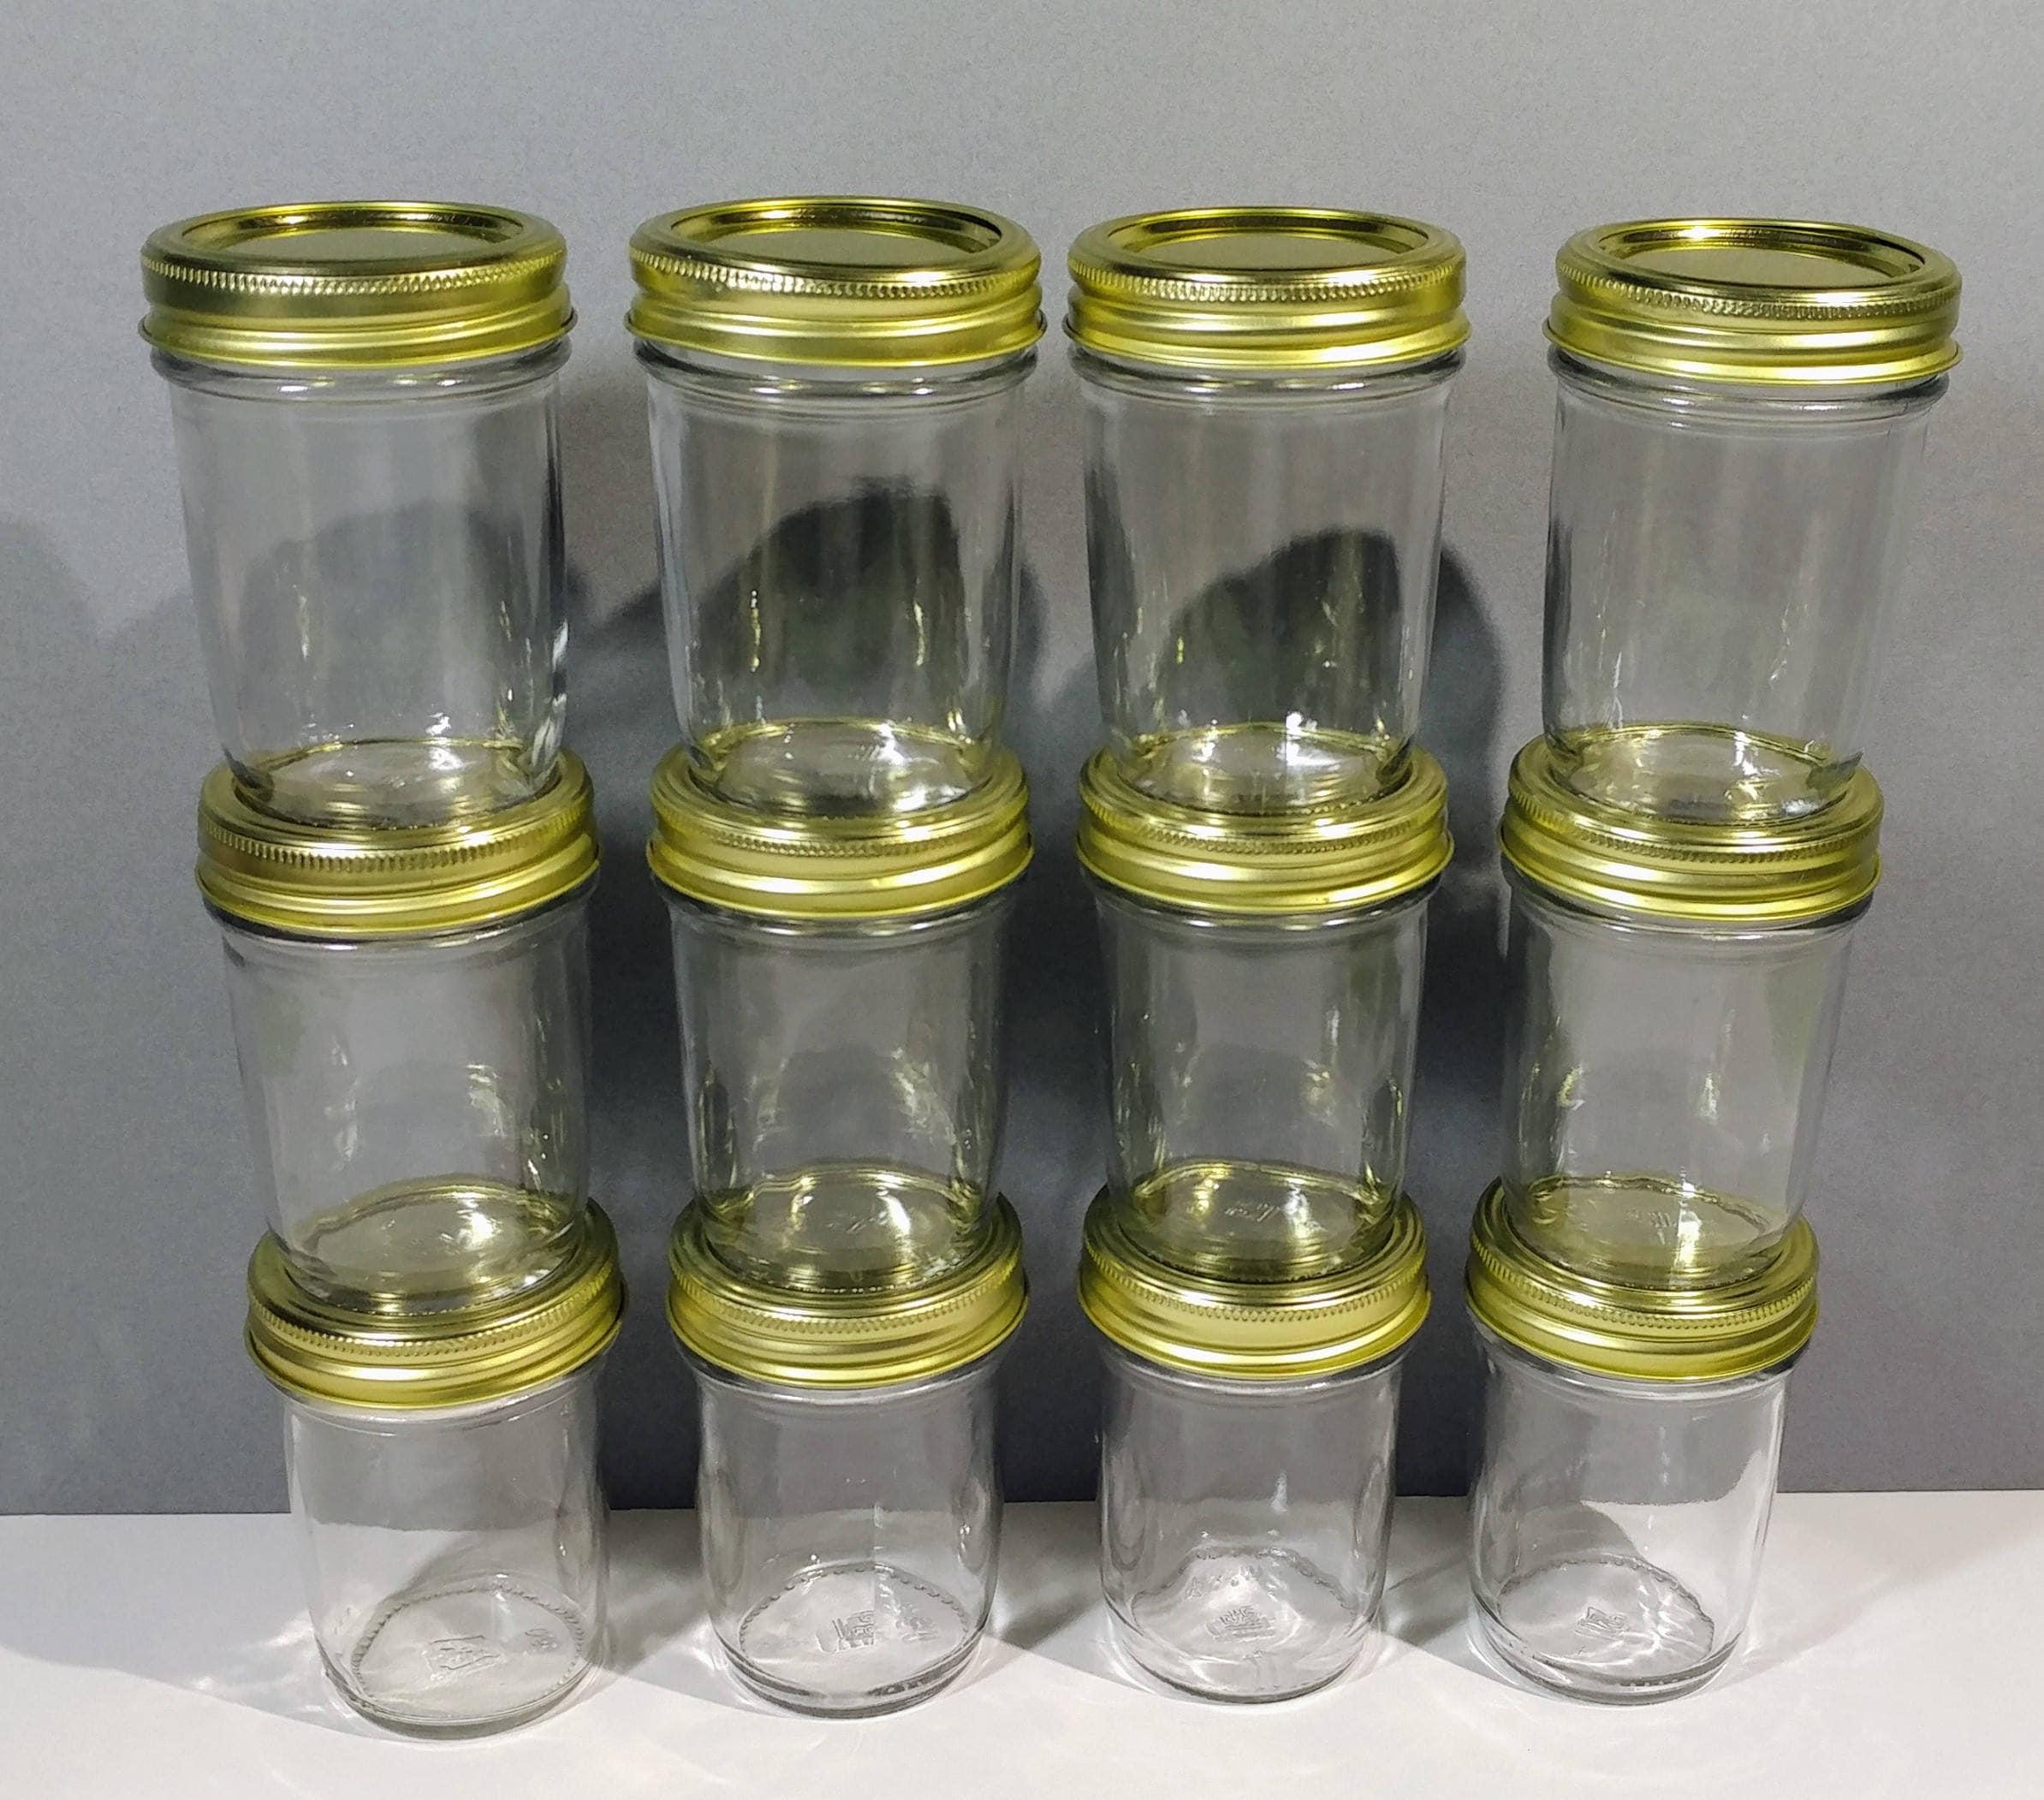 12 clear glass 8oz mason style jar collection gold cap lid. Black Bedroom Furniture Sets. Home Design Ideas